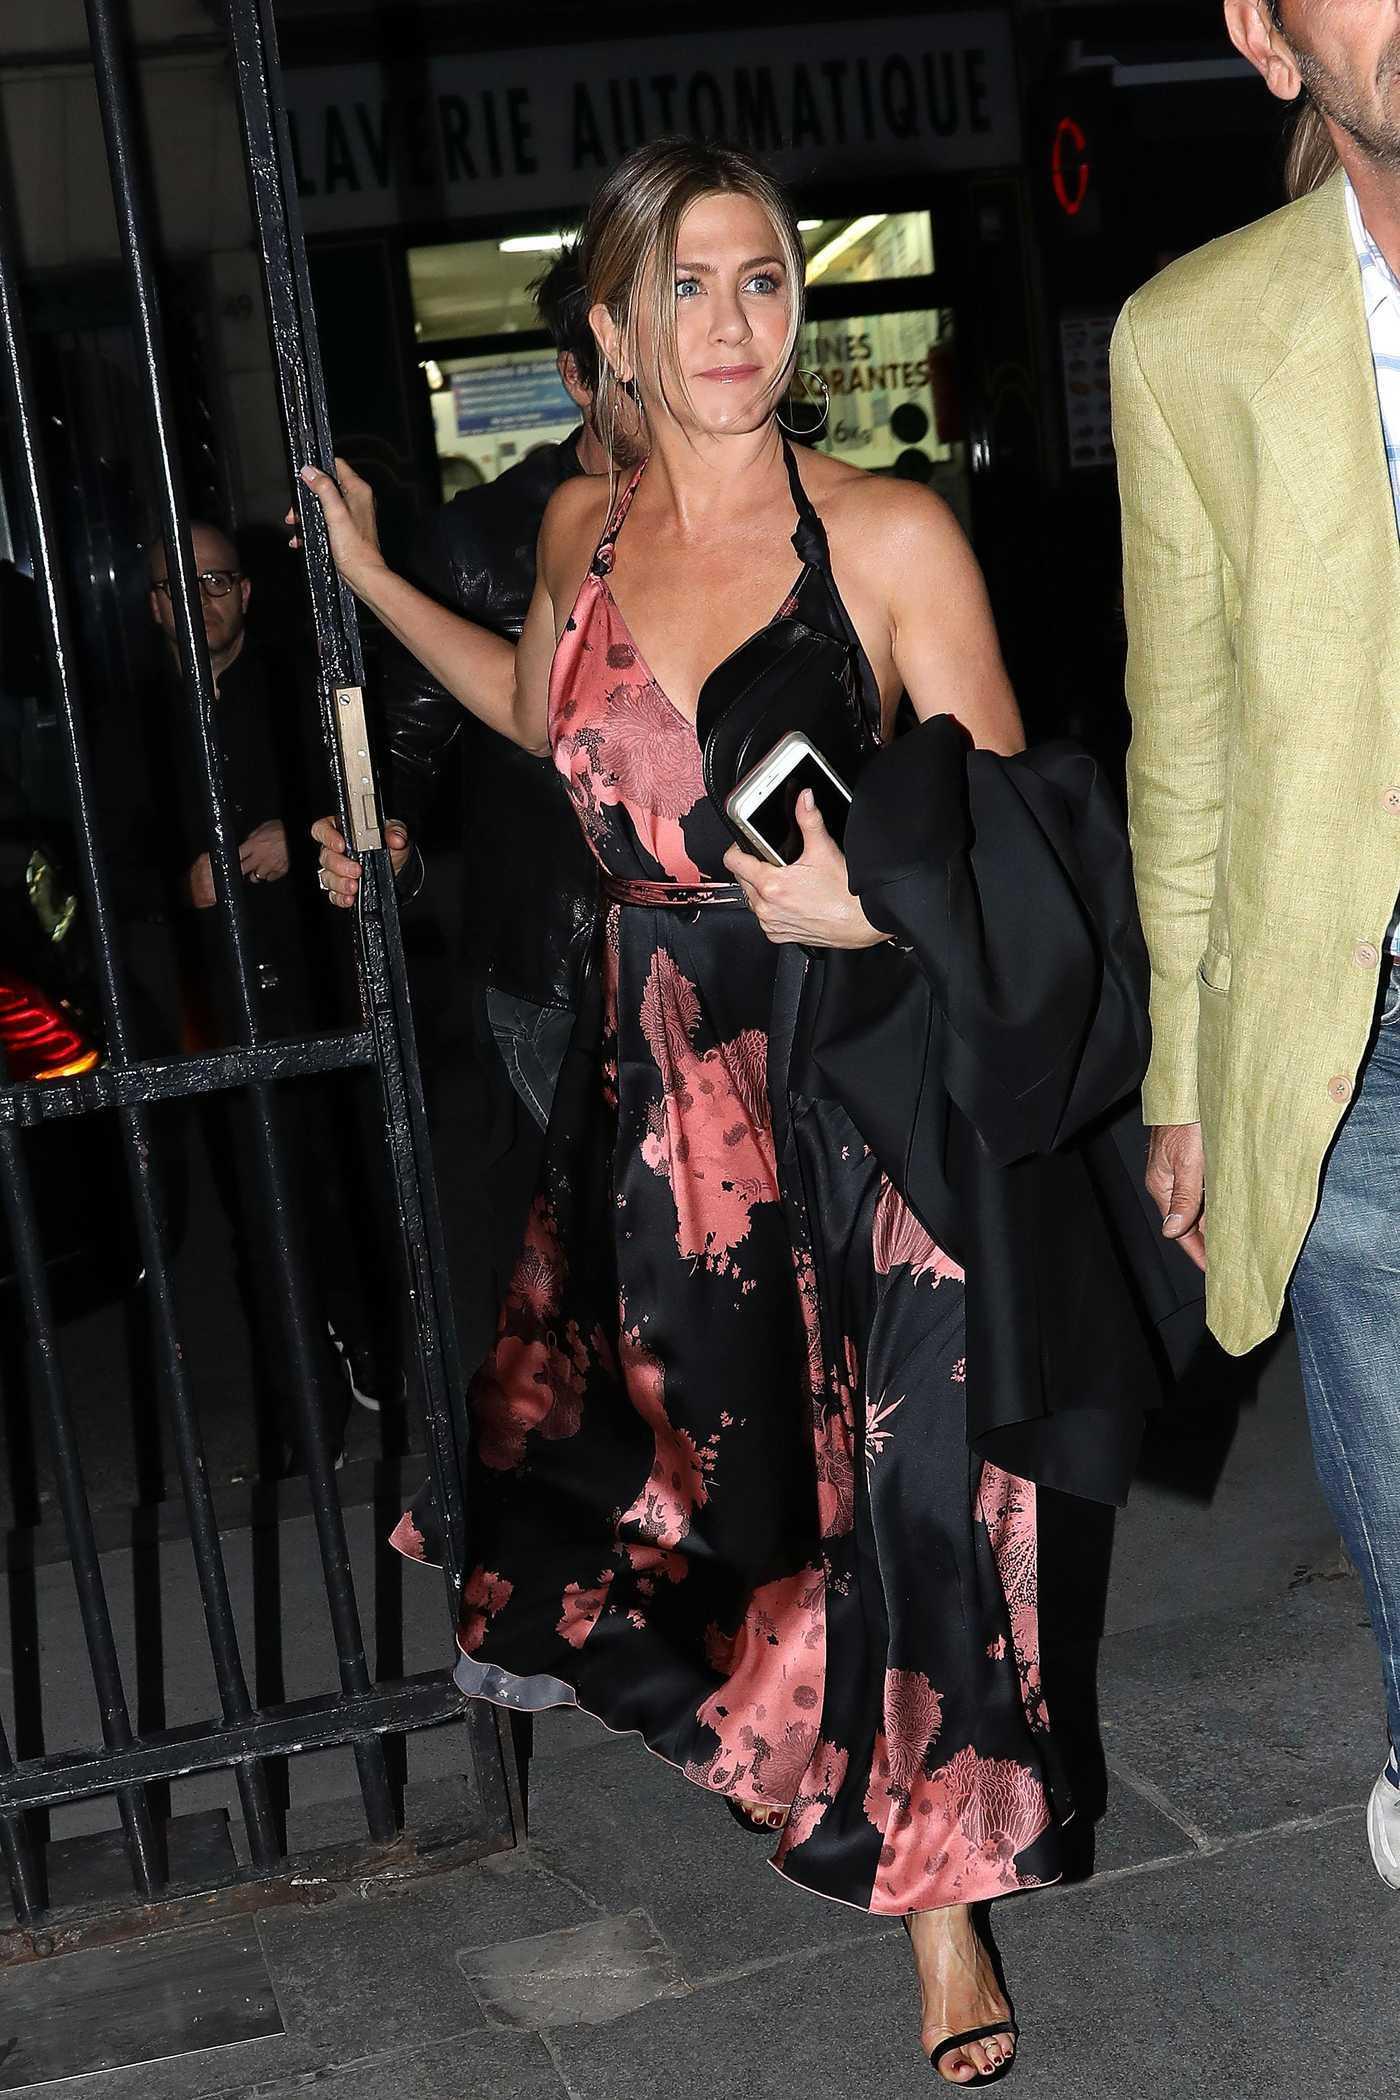 Jennifer Aniston Arrives at Verjus Restaurant in Paris 04/12/2017